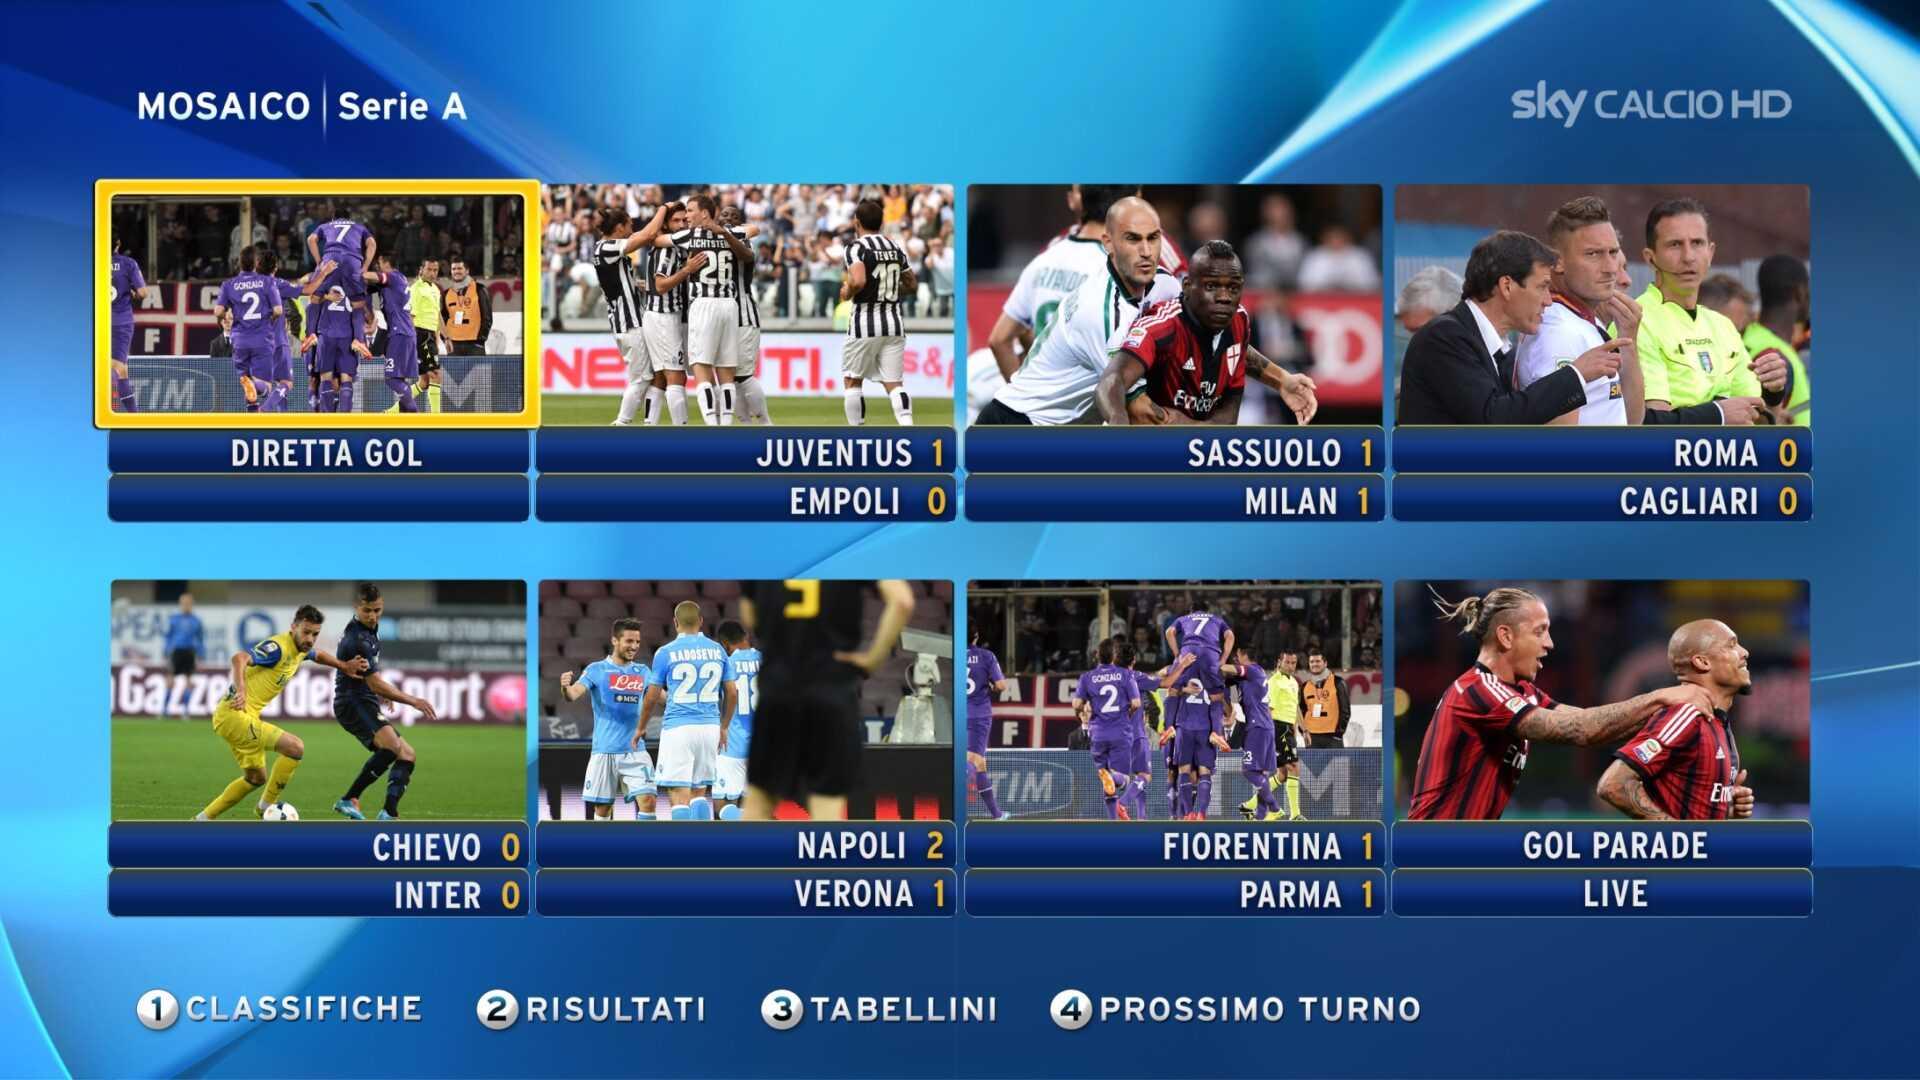 L'offerta calcio di Sky 2014 - 2015 in anteprima   Digitale terrestre: Dtti.it